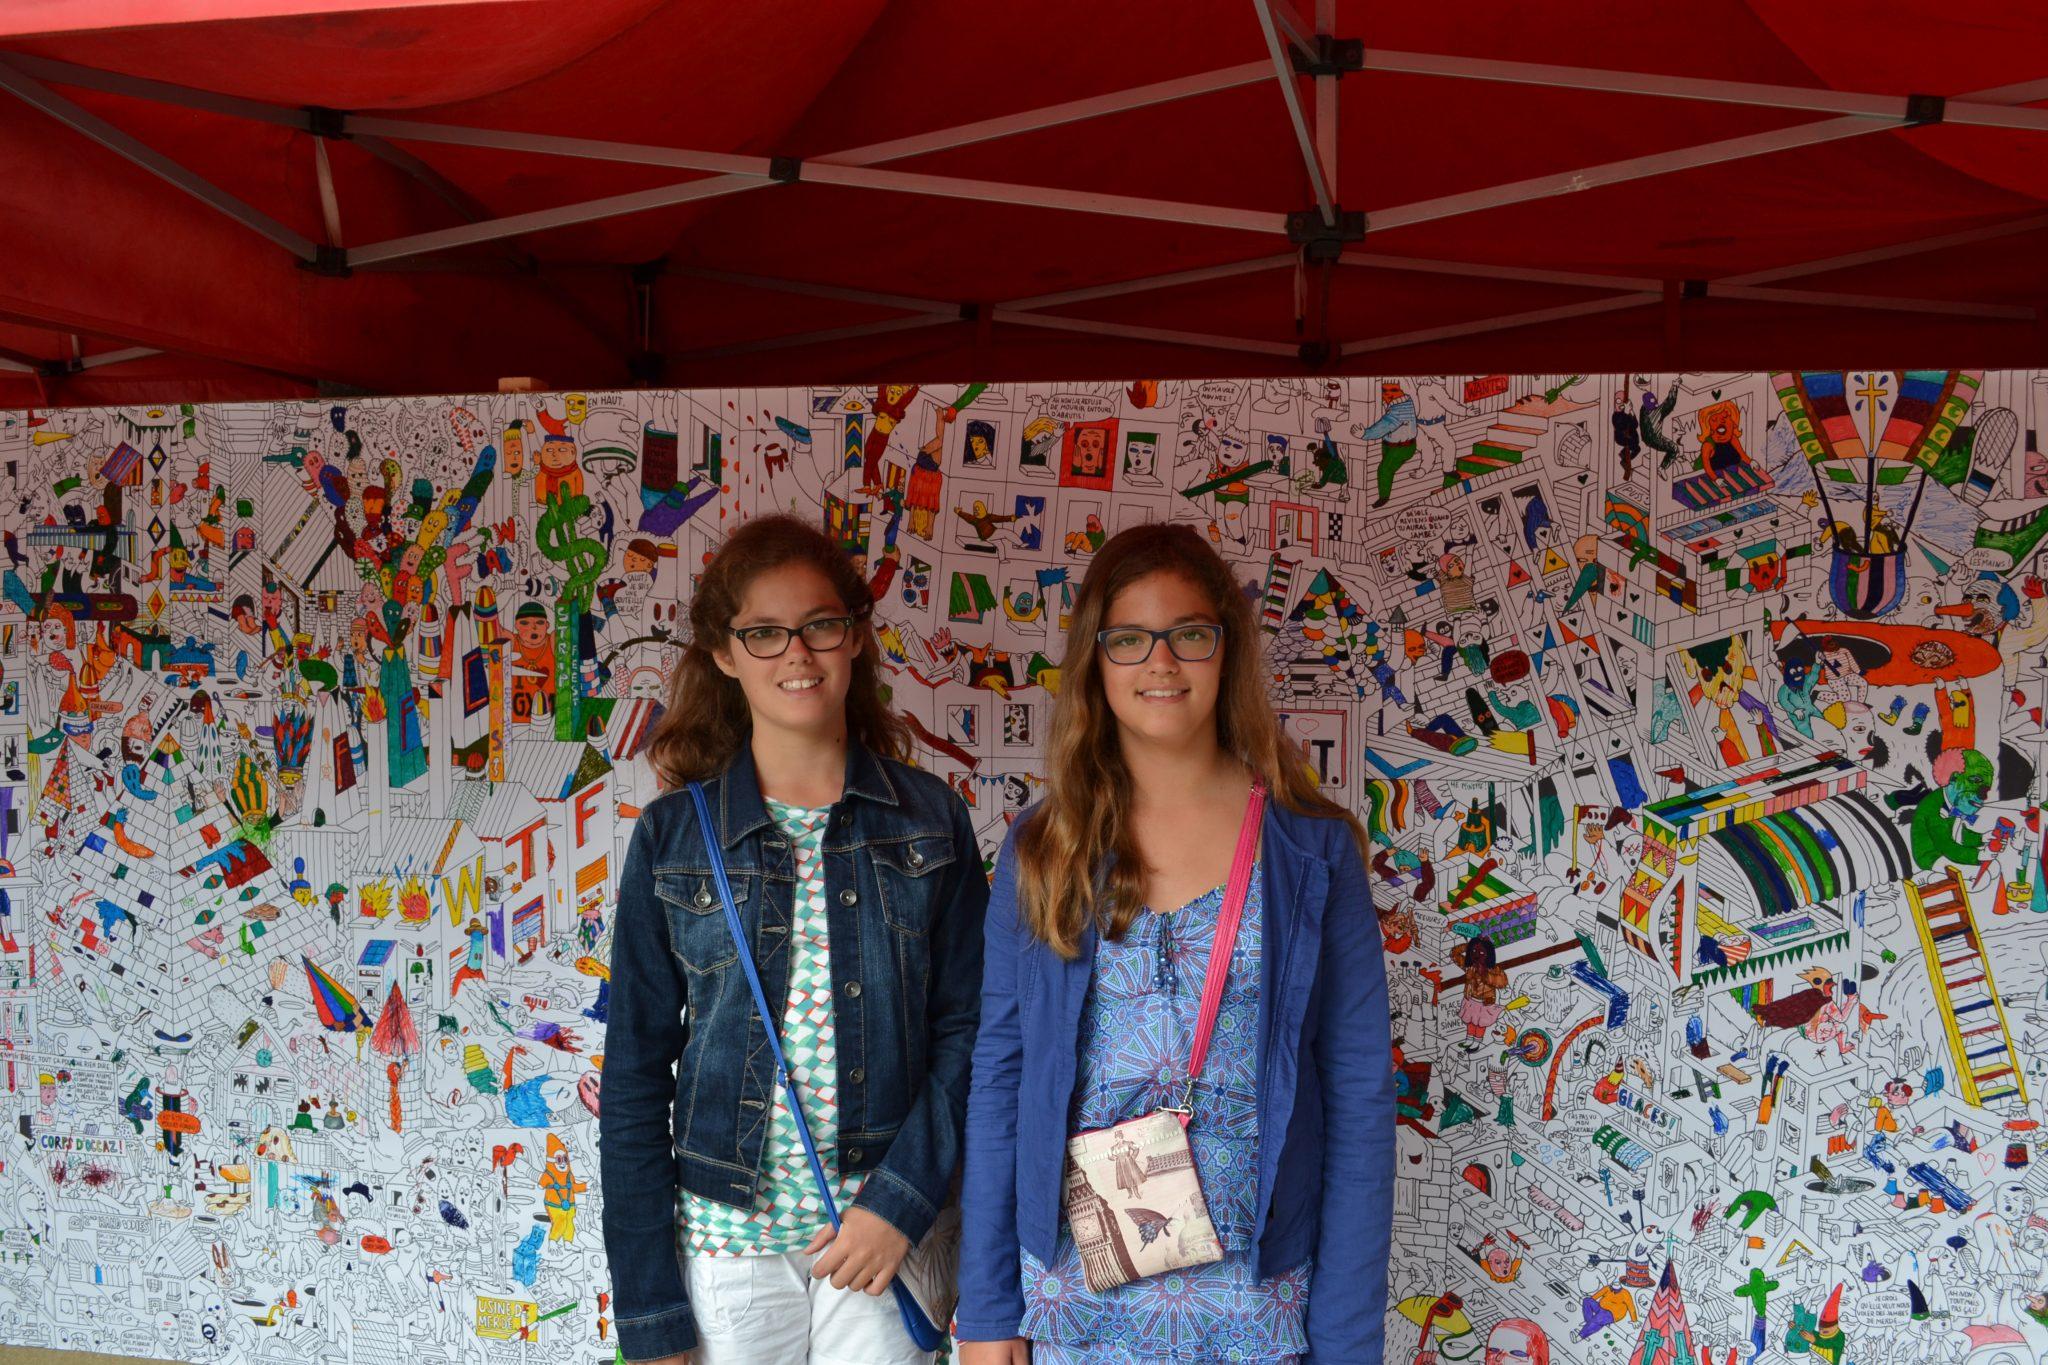 Comicfestival Brüssel - dsc 0001